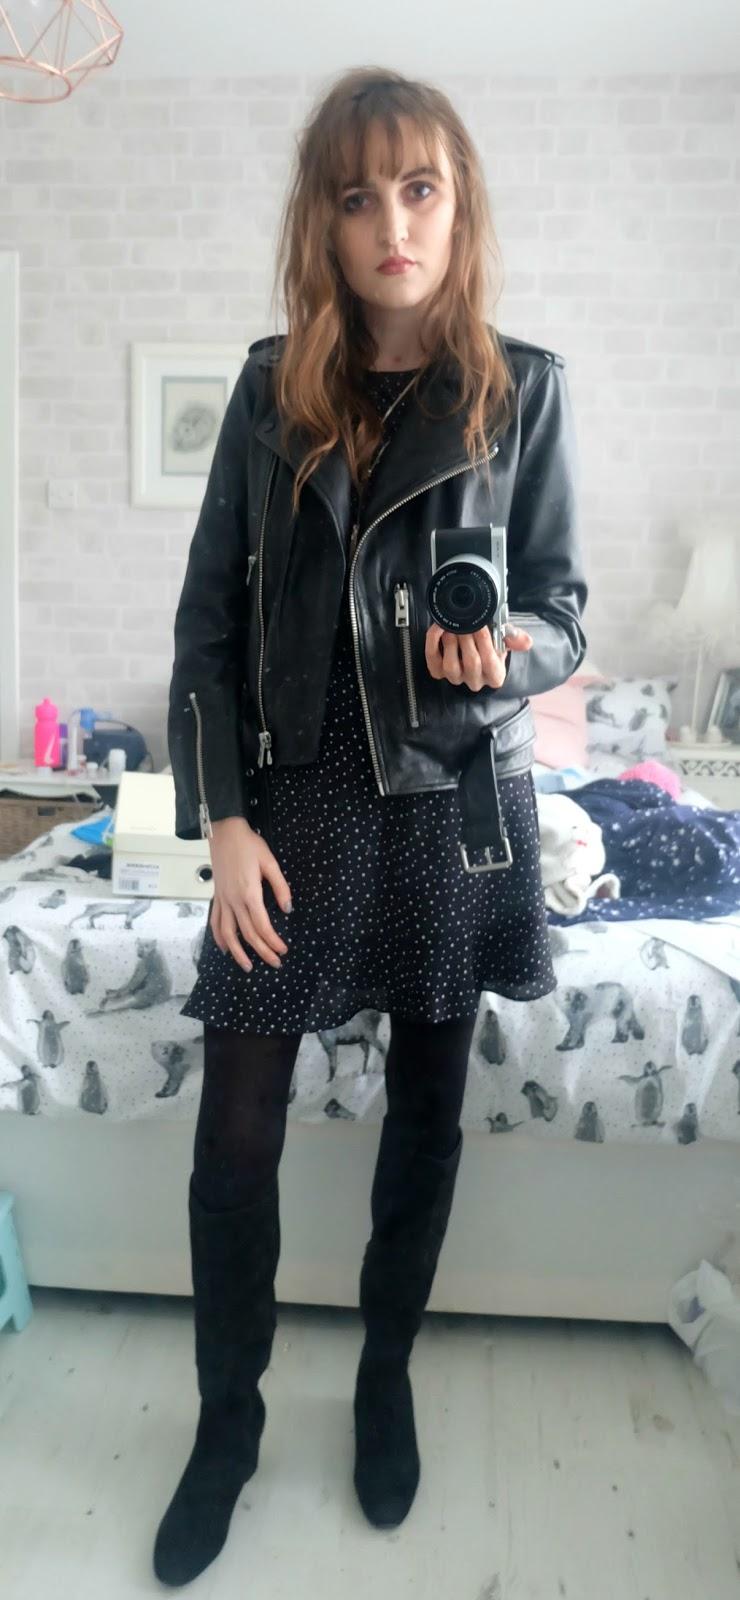 topshop navy star dress, balfern leather jacket, zara suedette over the knee boots,